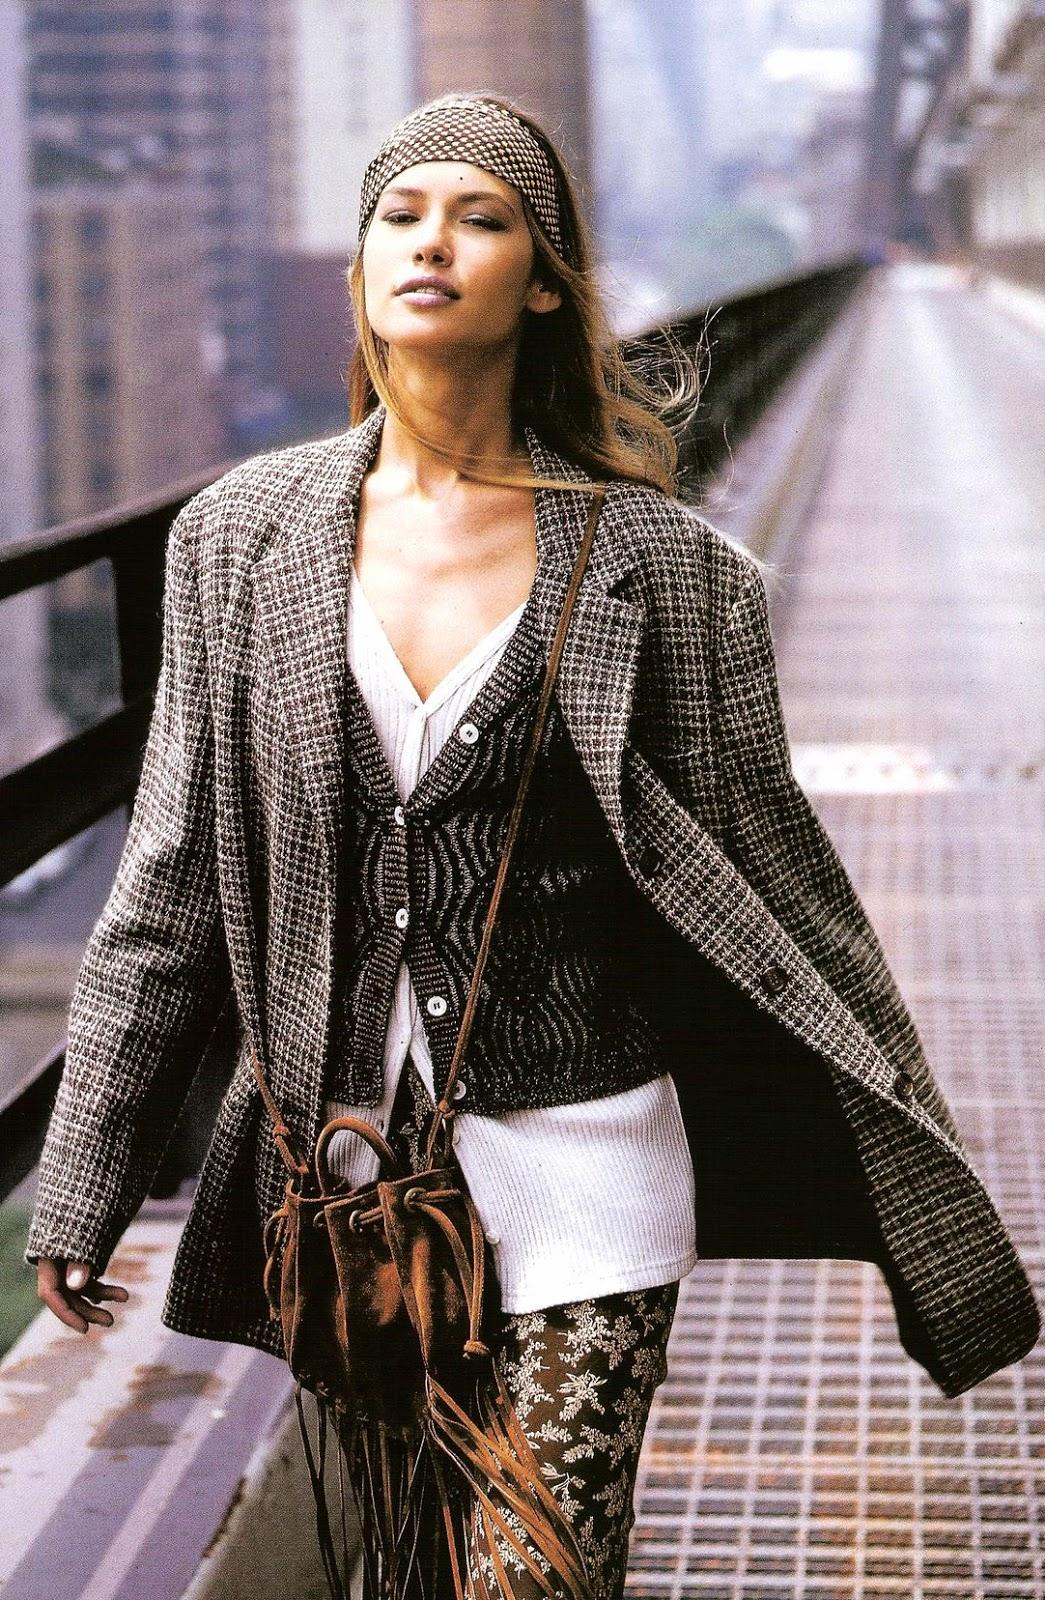 Valeria Mazza in Elle US October 1993